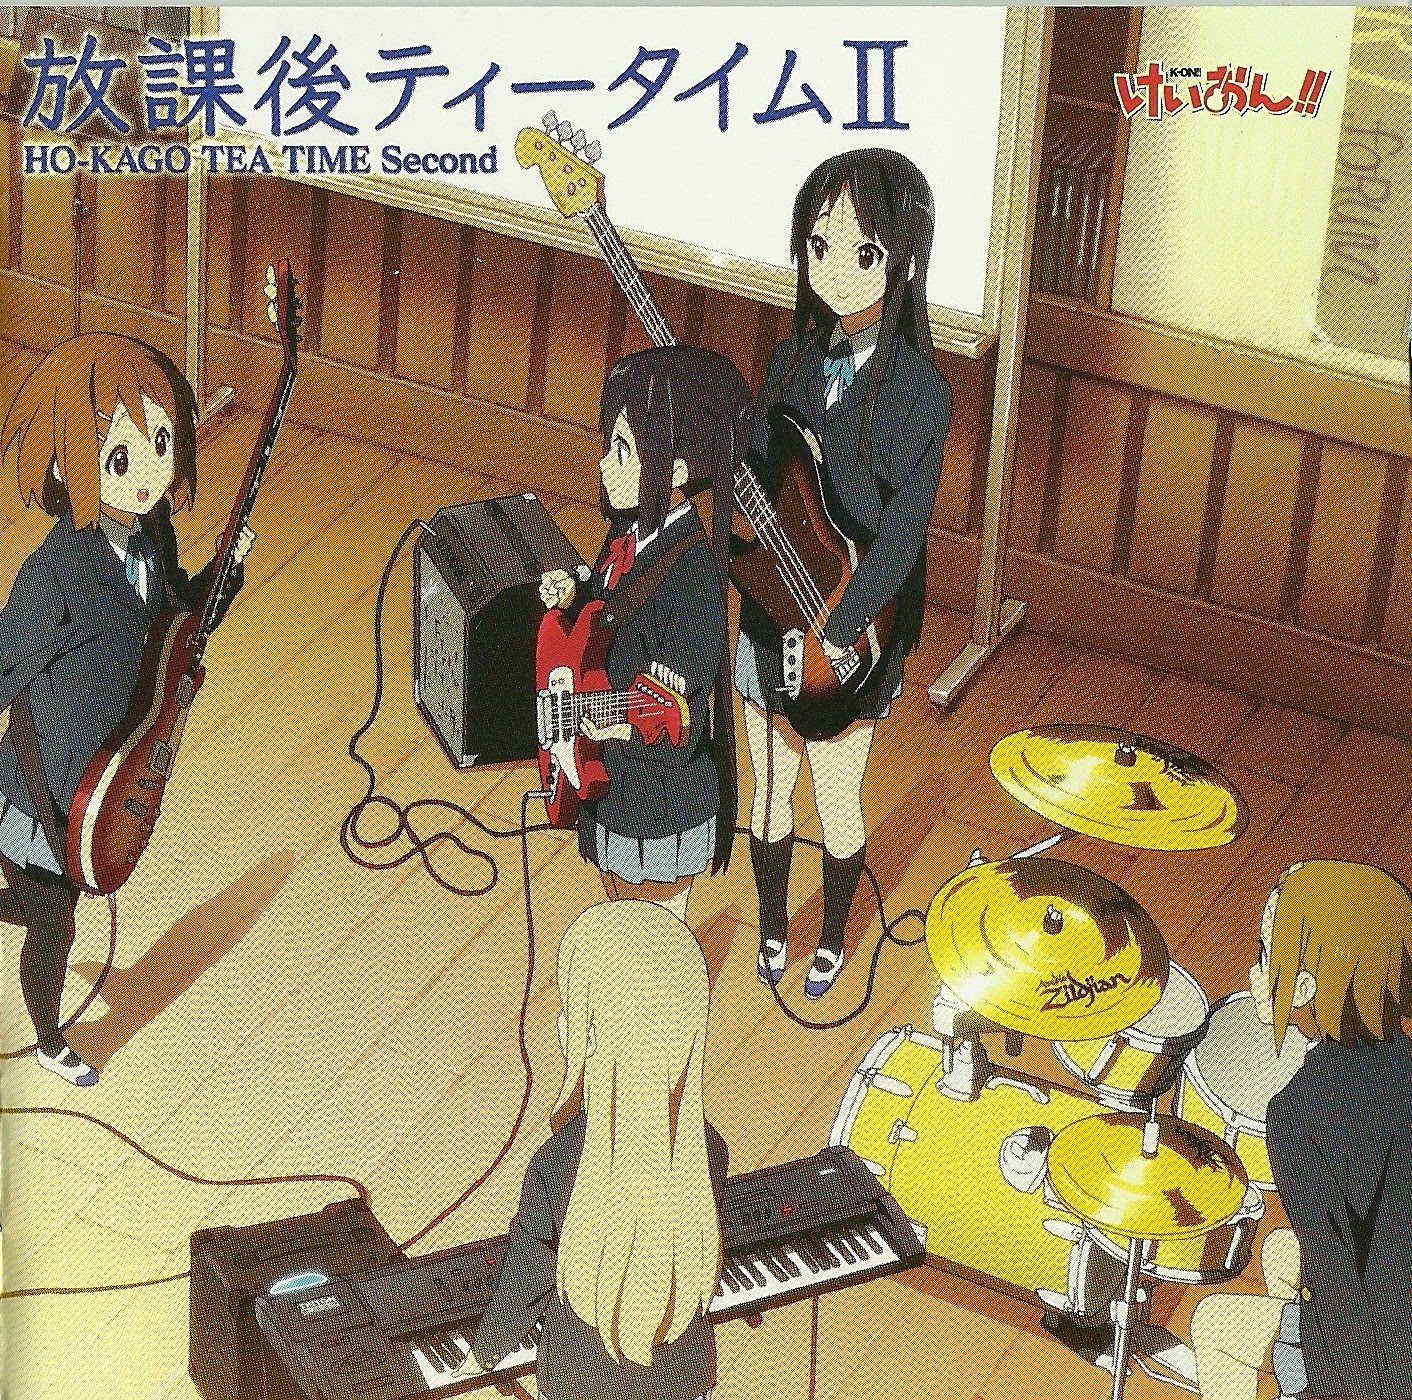 HO-KAGO_TEA_TIME_Second - K-ON Houkago Tea Time II [Album][MP3] - Música [Descarga]